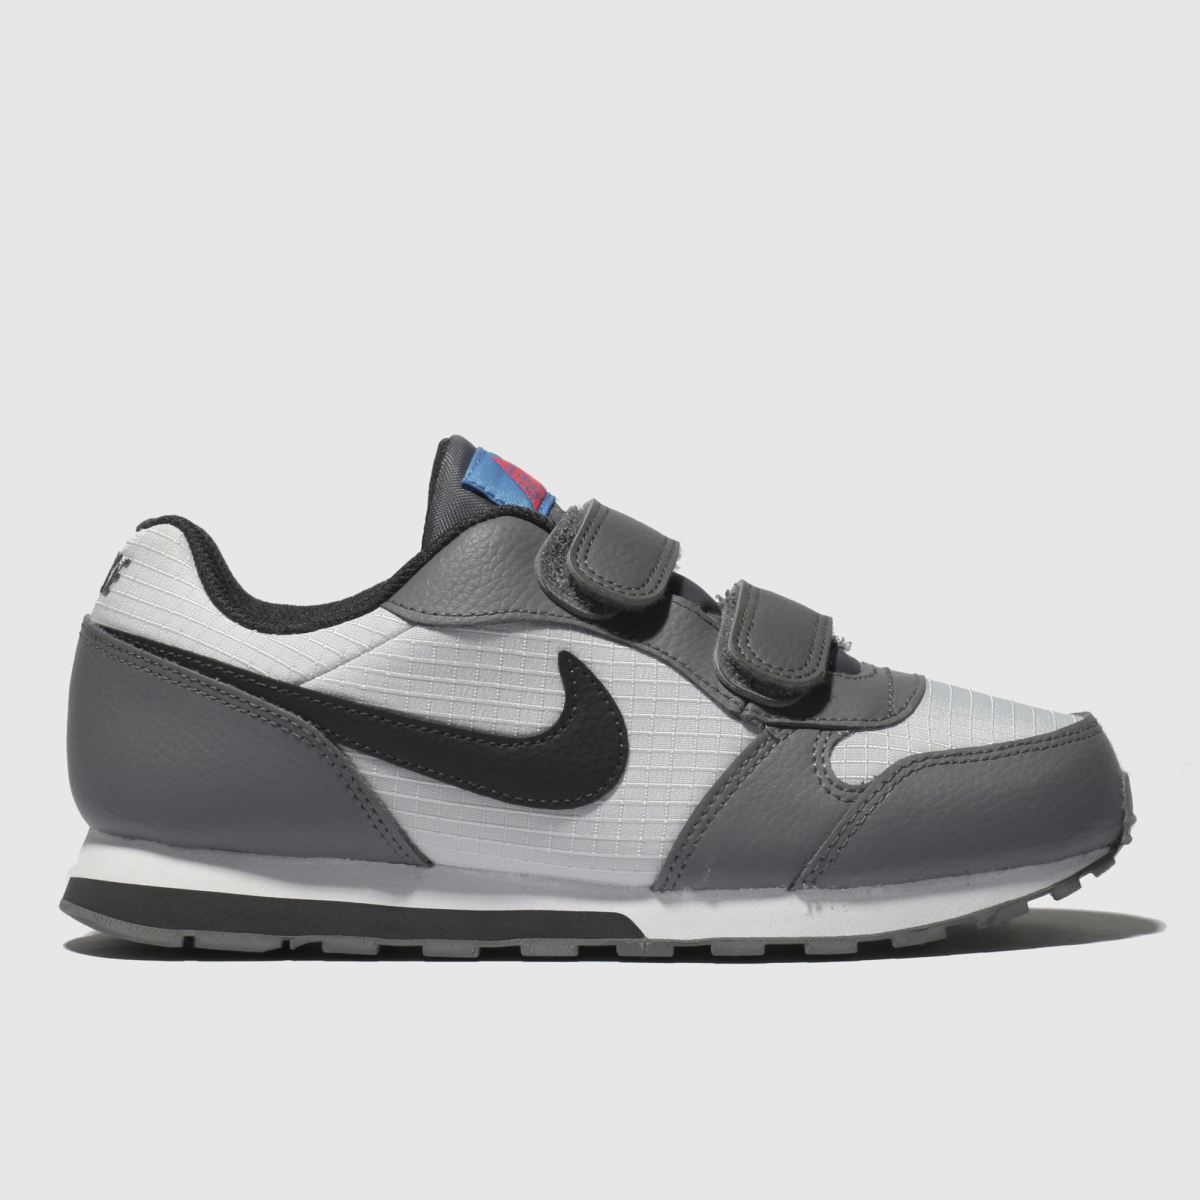 Nike White & Grey Md Runner 2 Trainers Junior